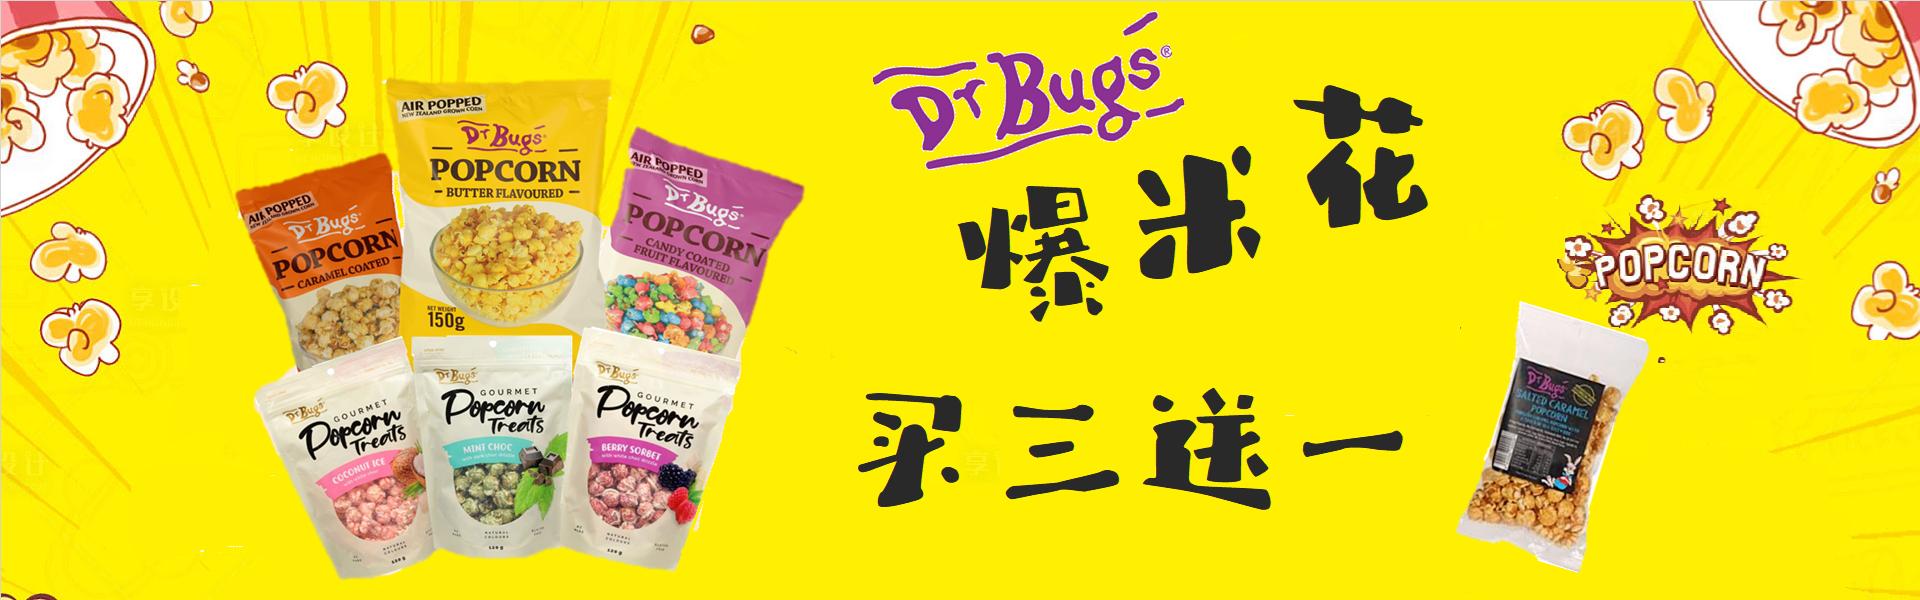 Dr Bugs爆米花买三送一